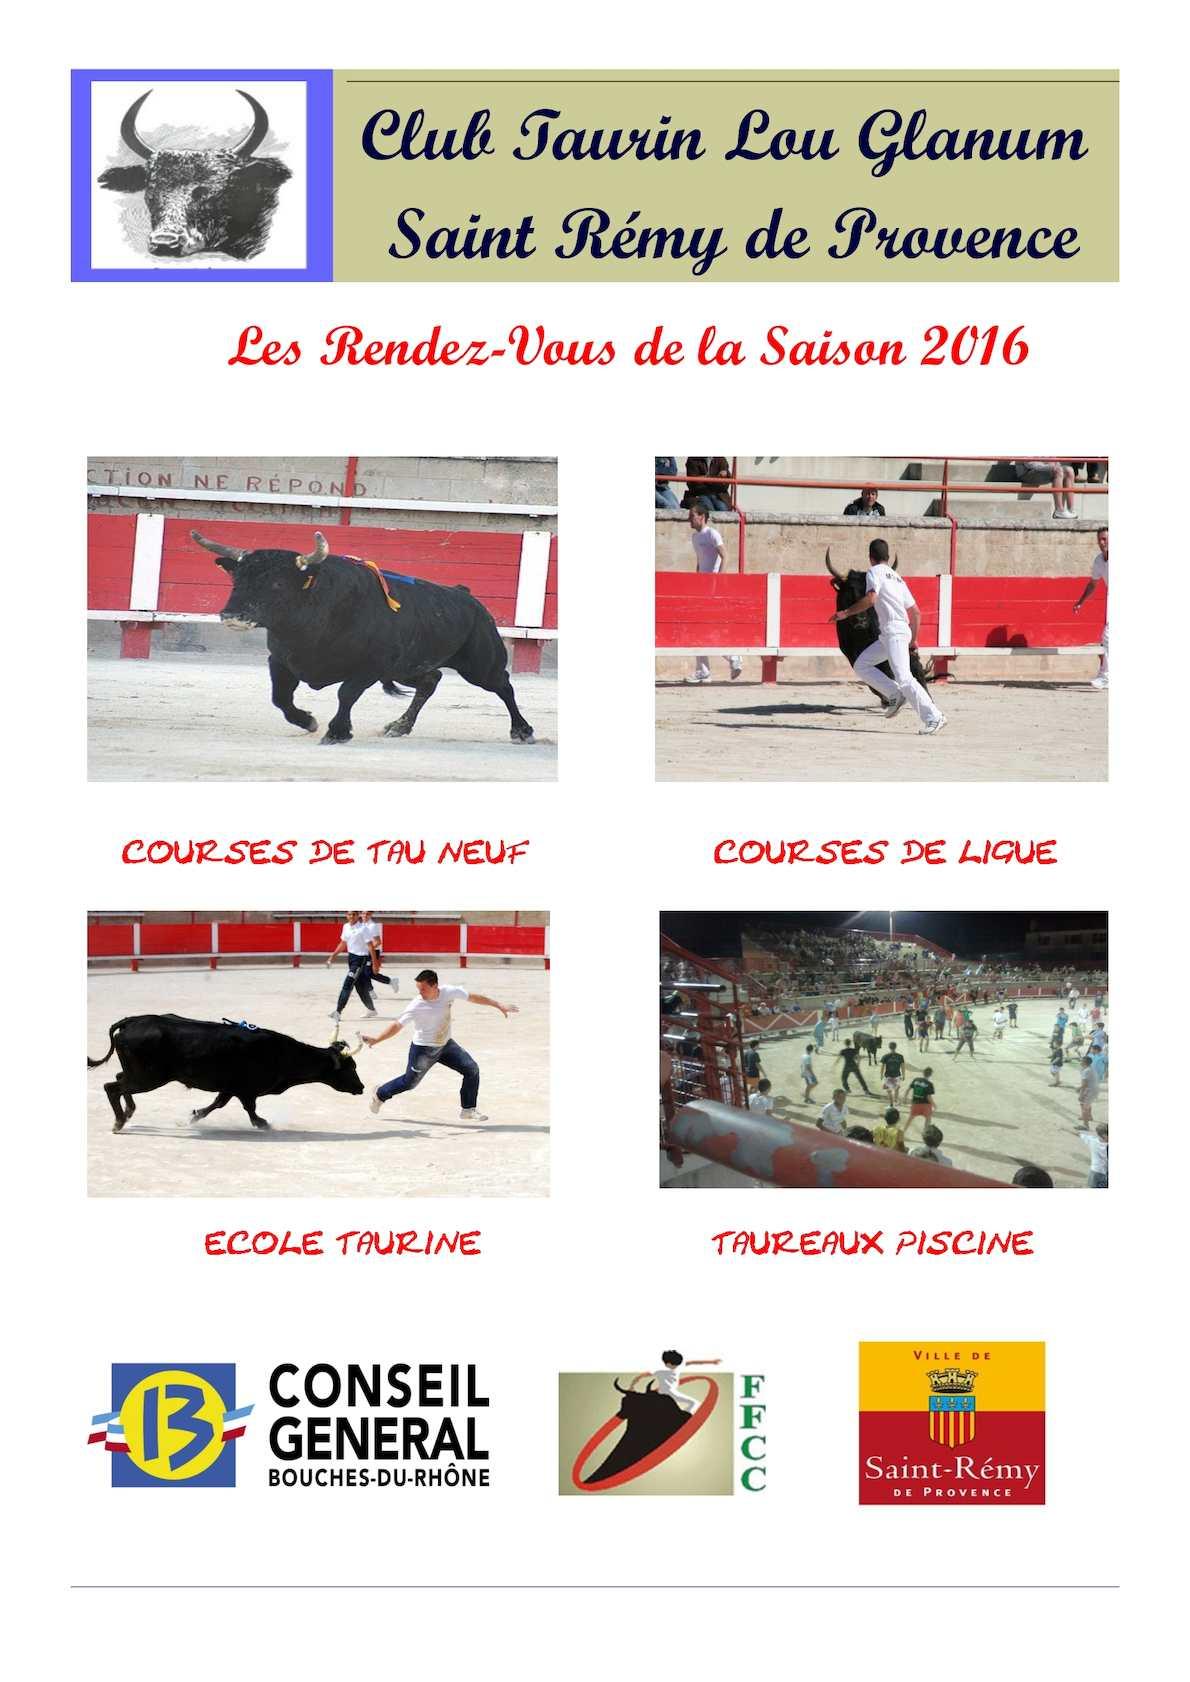 Ffcc Calendrier Des Courses Camarguaises.Calameo Calendrier 2016 Club Taurin Lou Glanum Arenes